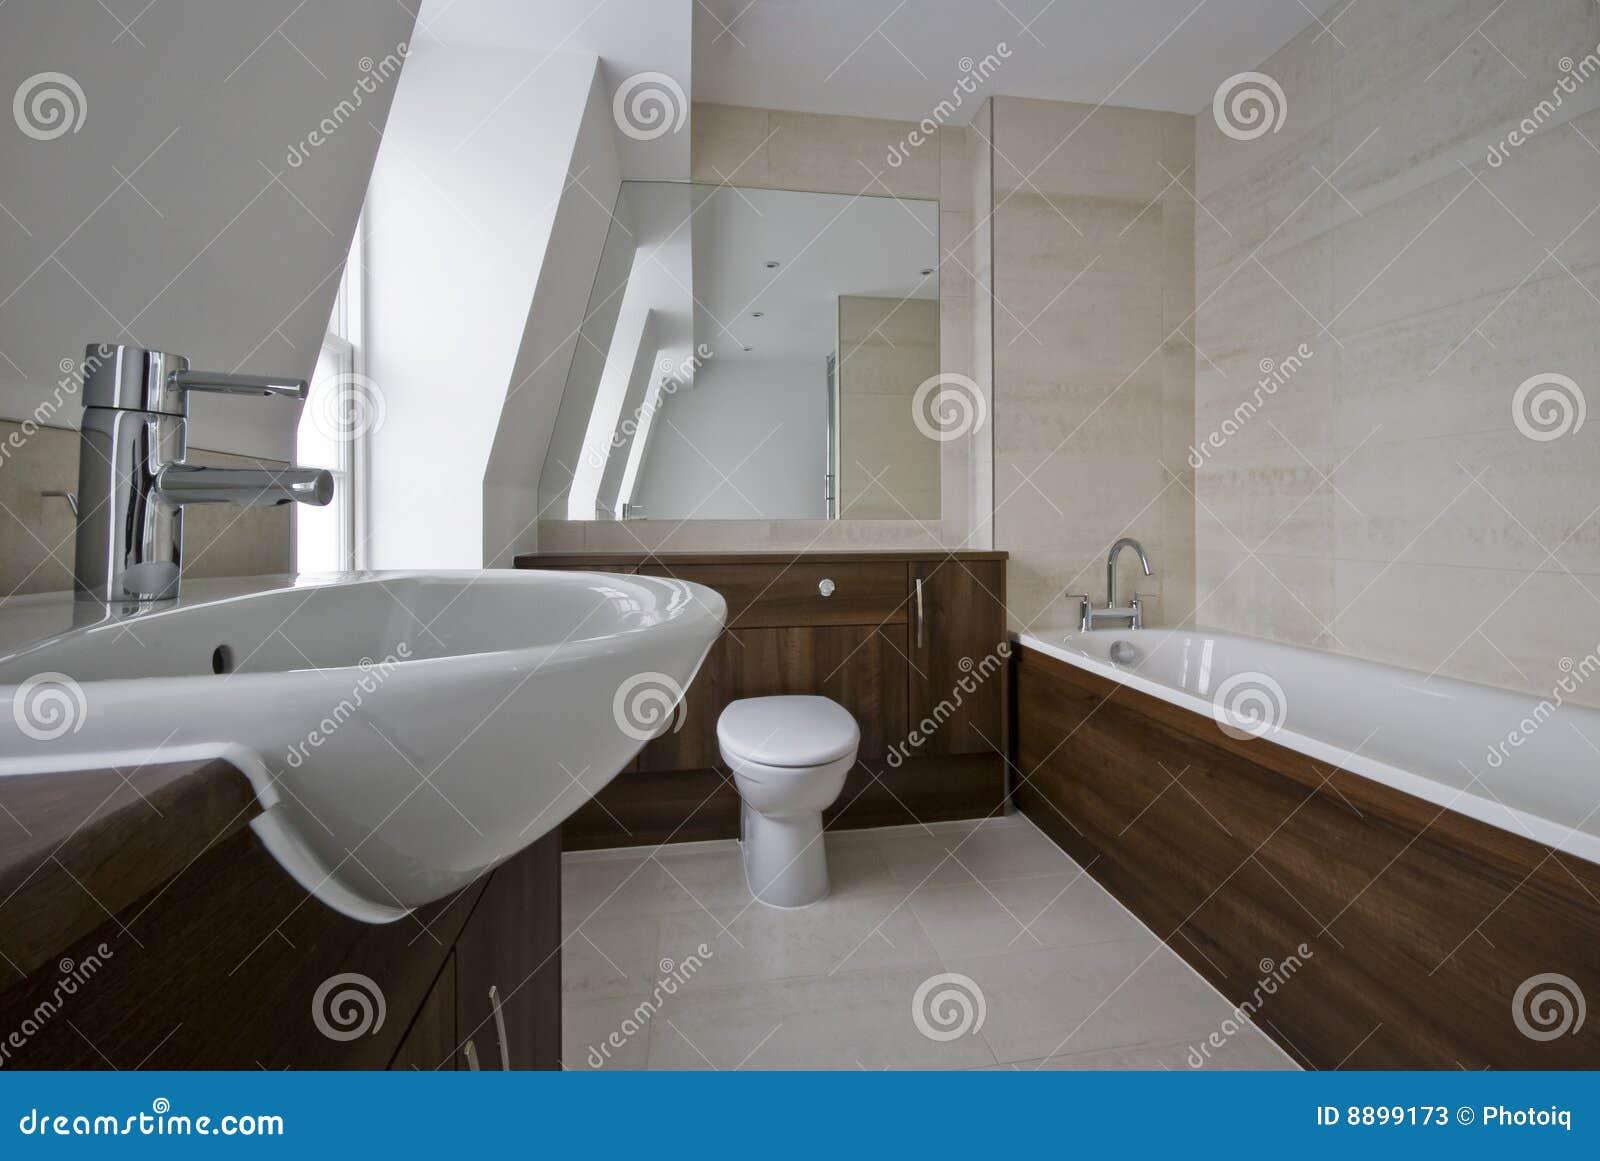 Salle de bain marbre moderne: salles de bains en marbre. le ...